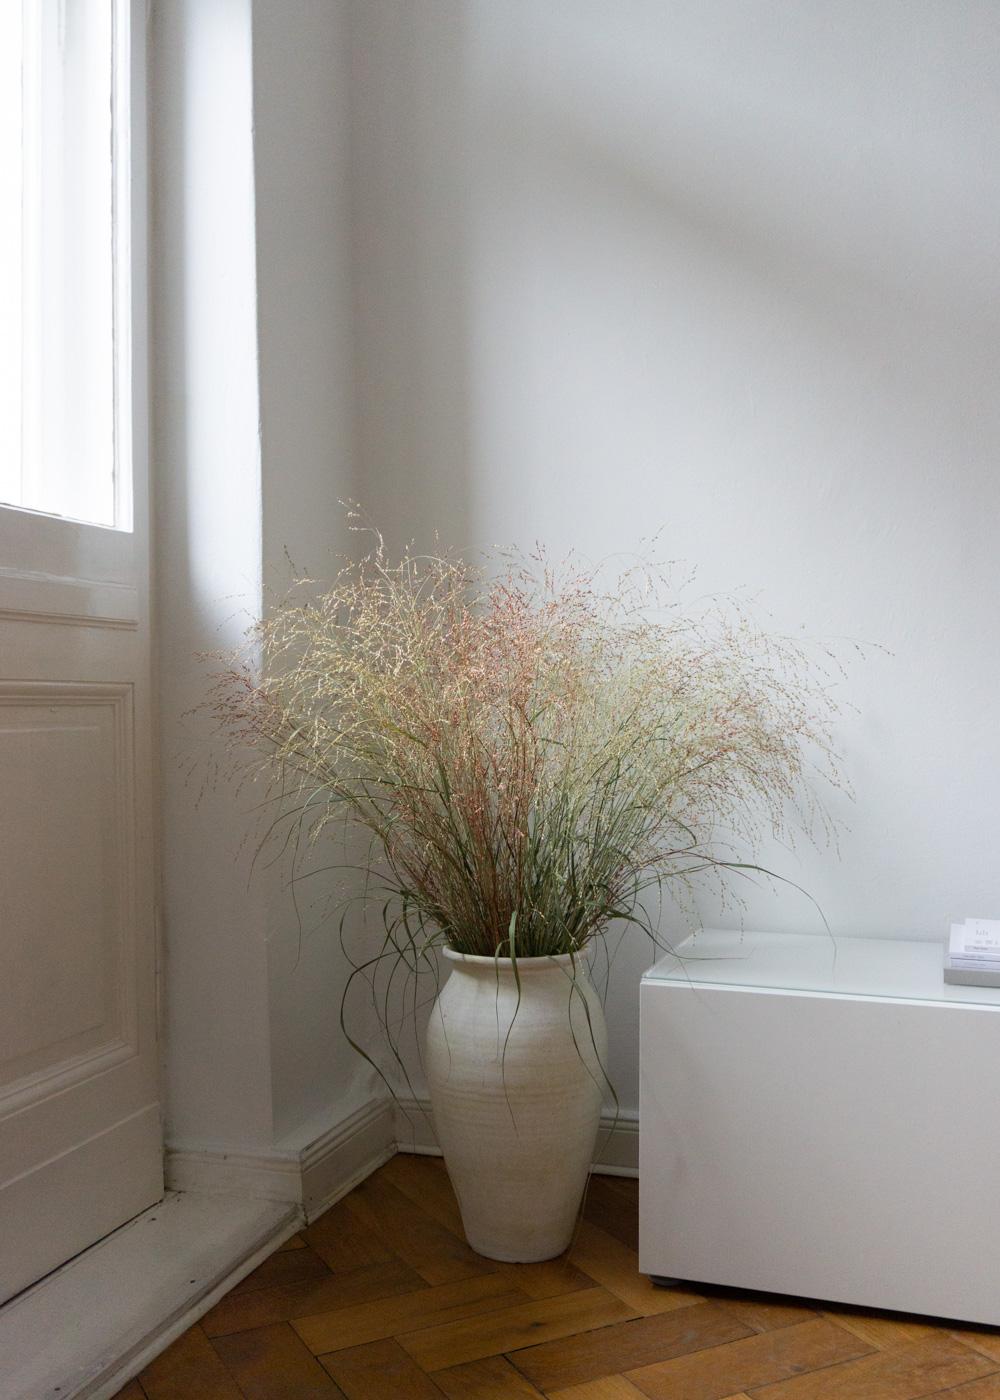 berlin-altbau-interior-design-style-minimal-white-beige-turn-scandinavian-designer-rgdaily-rg-daily-blog-4